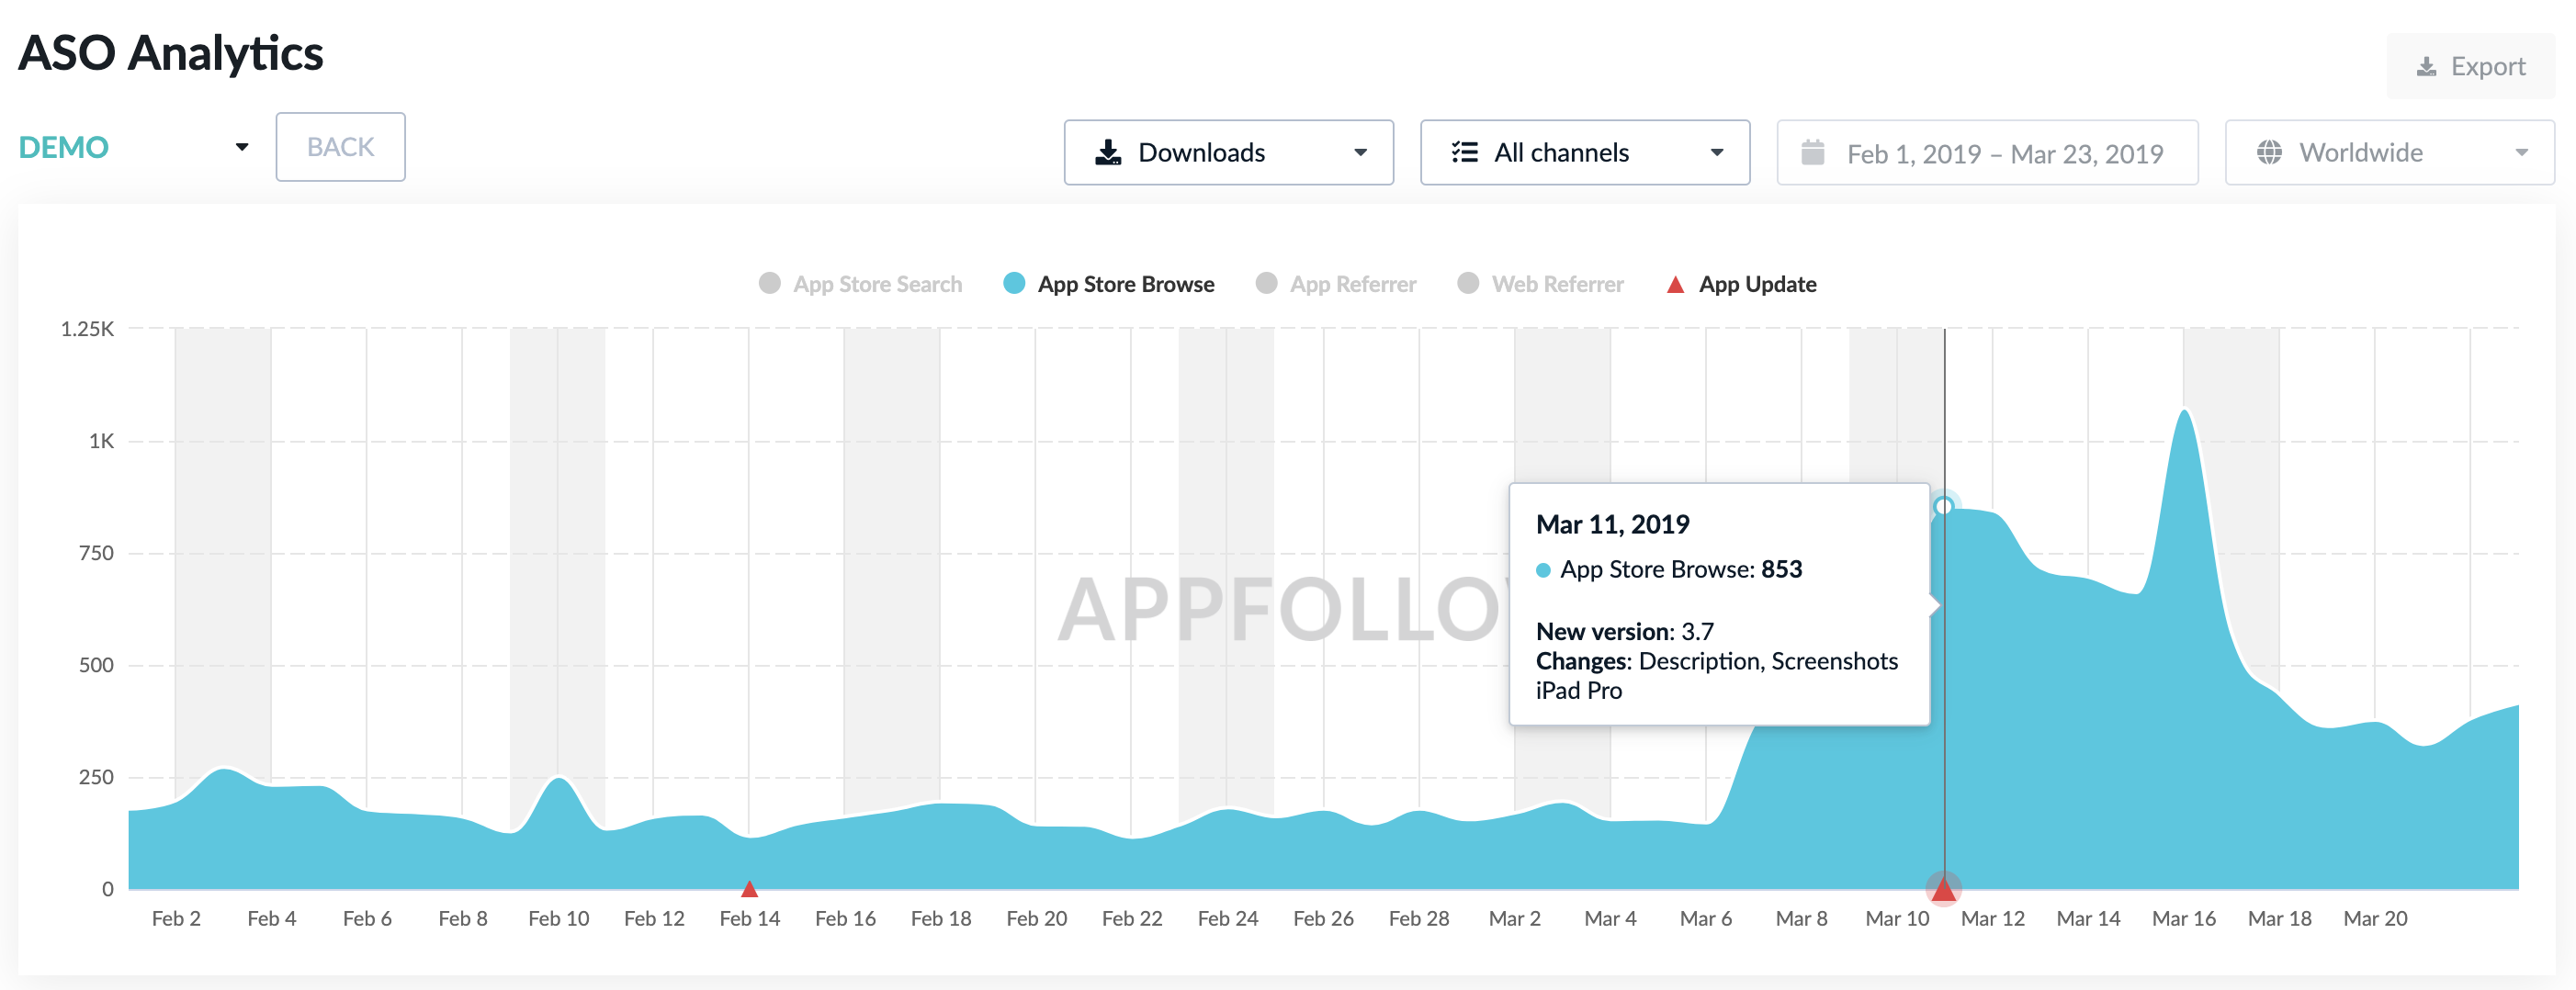 ASO Analytics - AppFollow Help Center